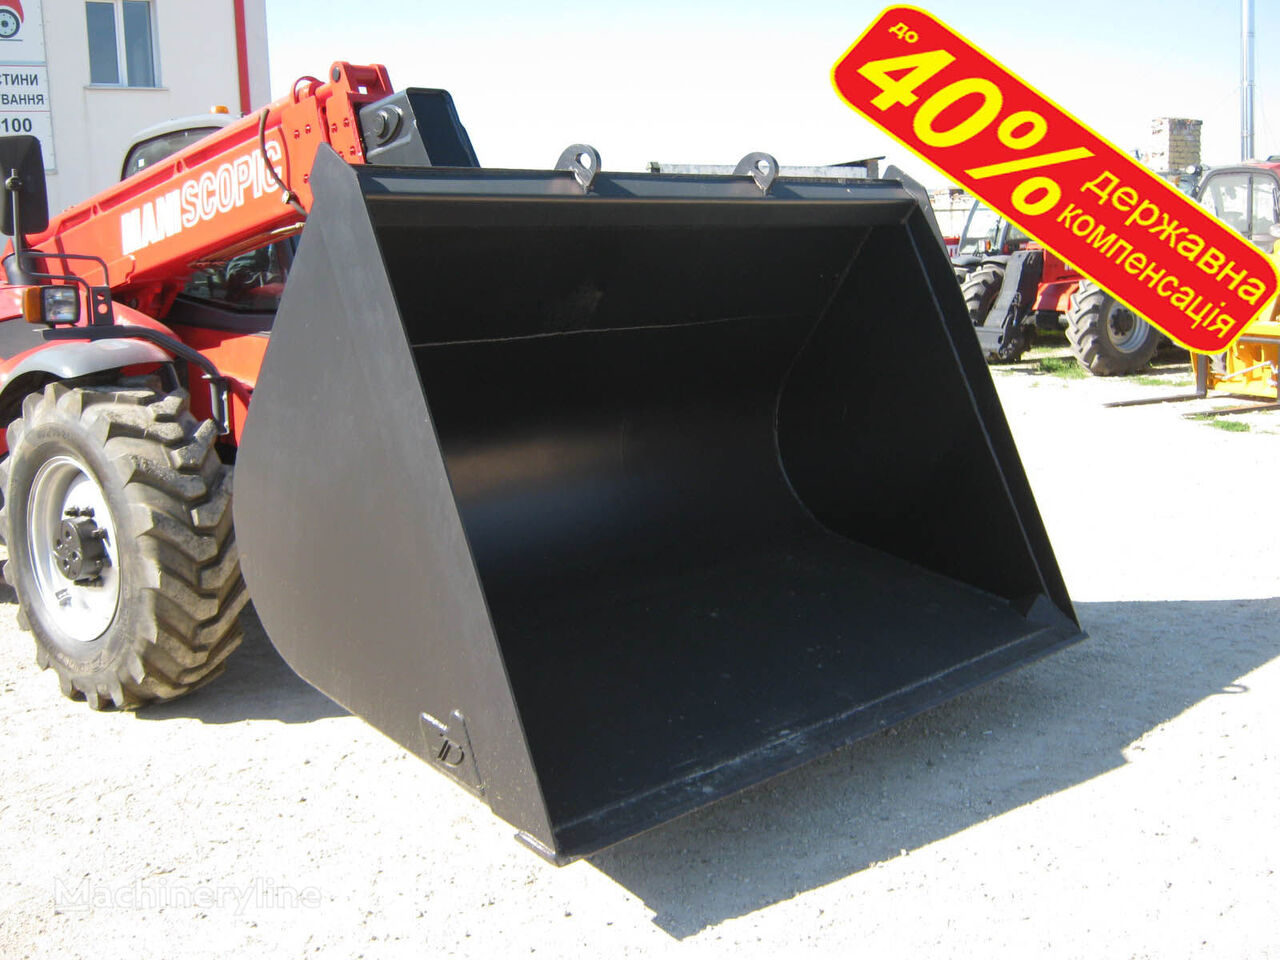 bucket loader depan MANITOU Kovsh - zernovoy kovsh 3m³ DERZhKOMPENSACIYa do 40% baru